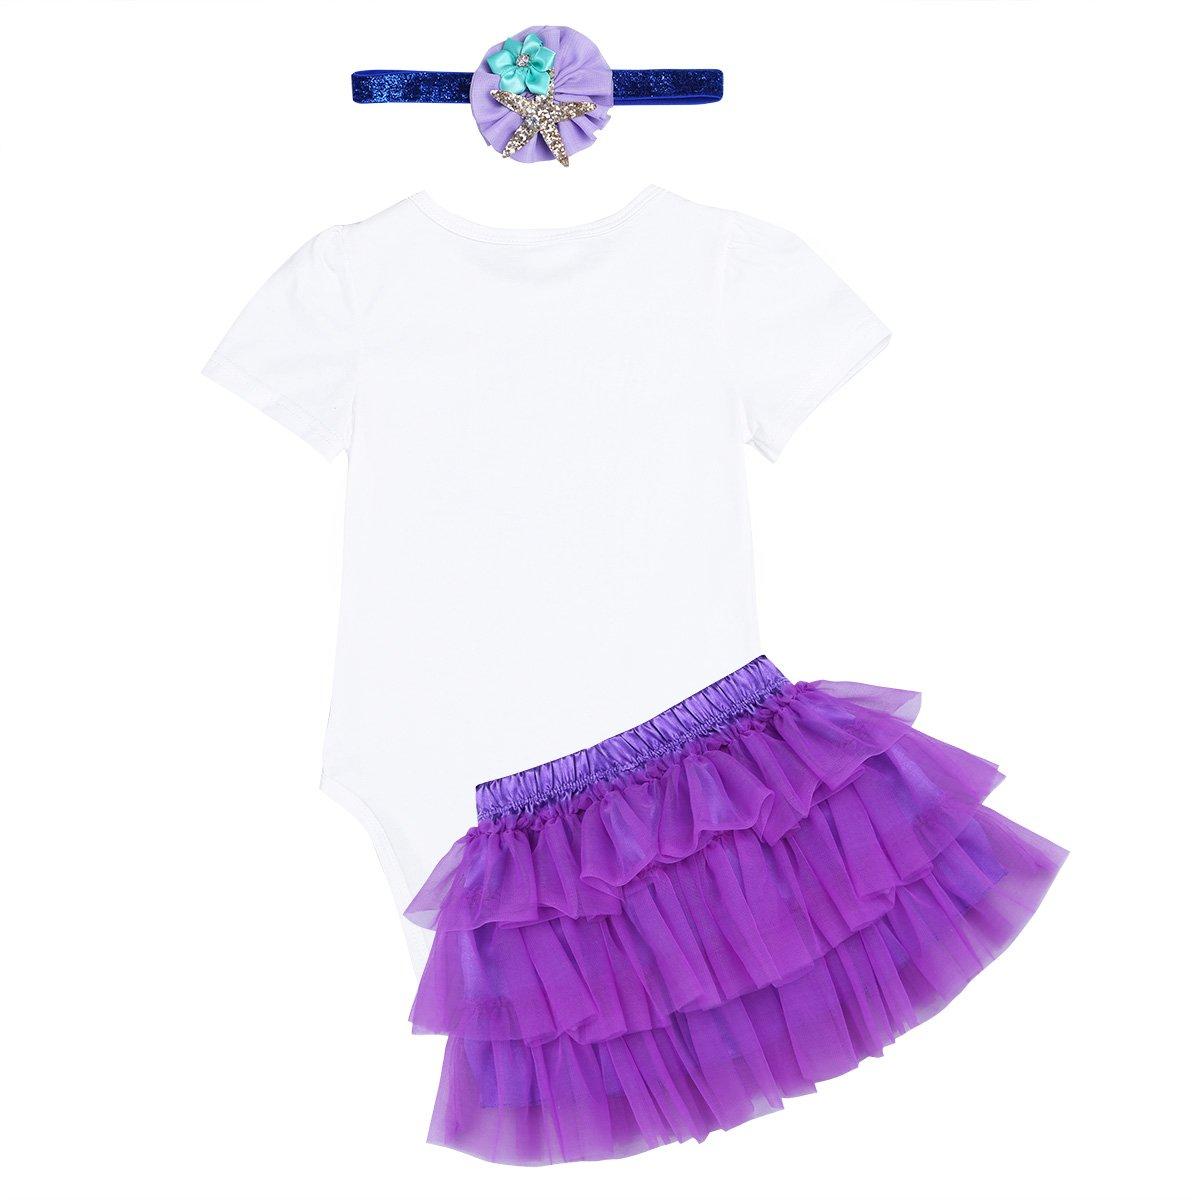 69efdd6c8ed8 Amazon.com  CHICTRY Little Baby Girls 1st Birthday Outfit Mermaid Costume  Princess Romper with Tutu Skirt Headband Set  Clothing